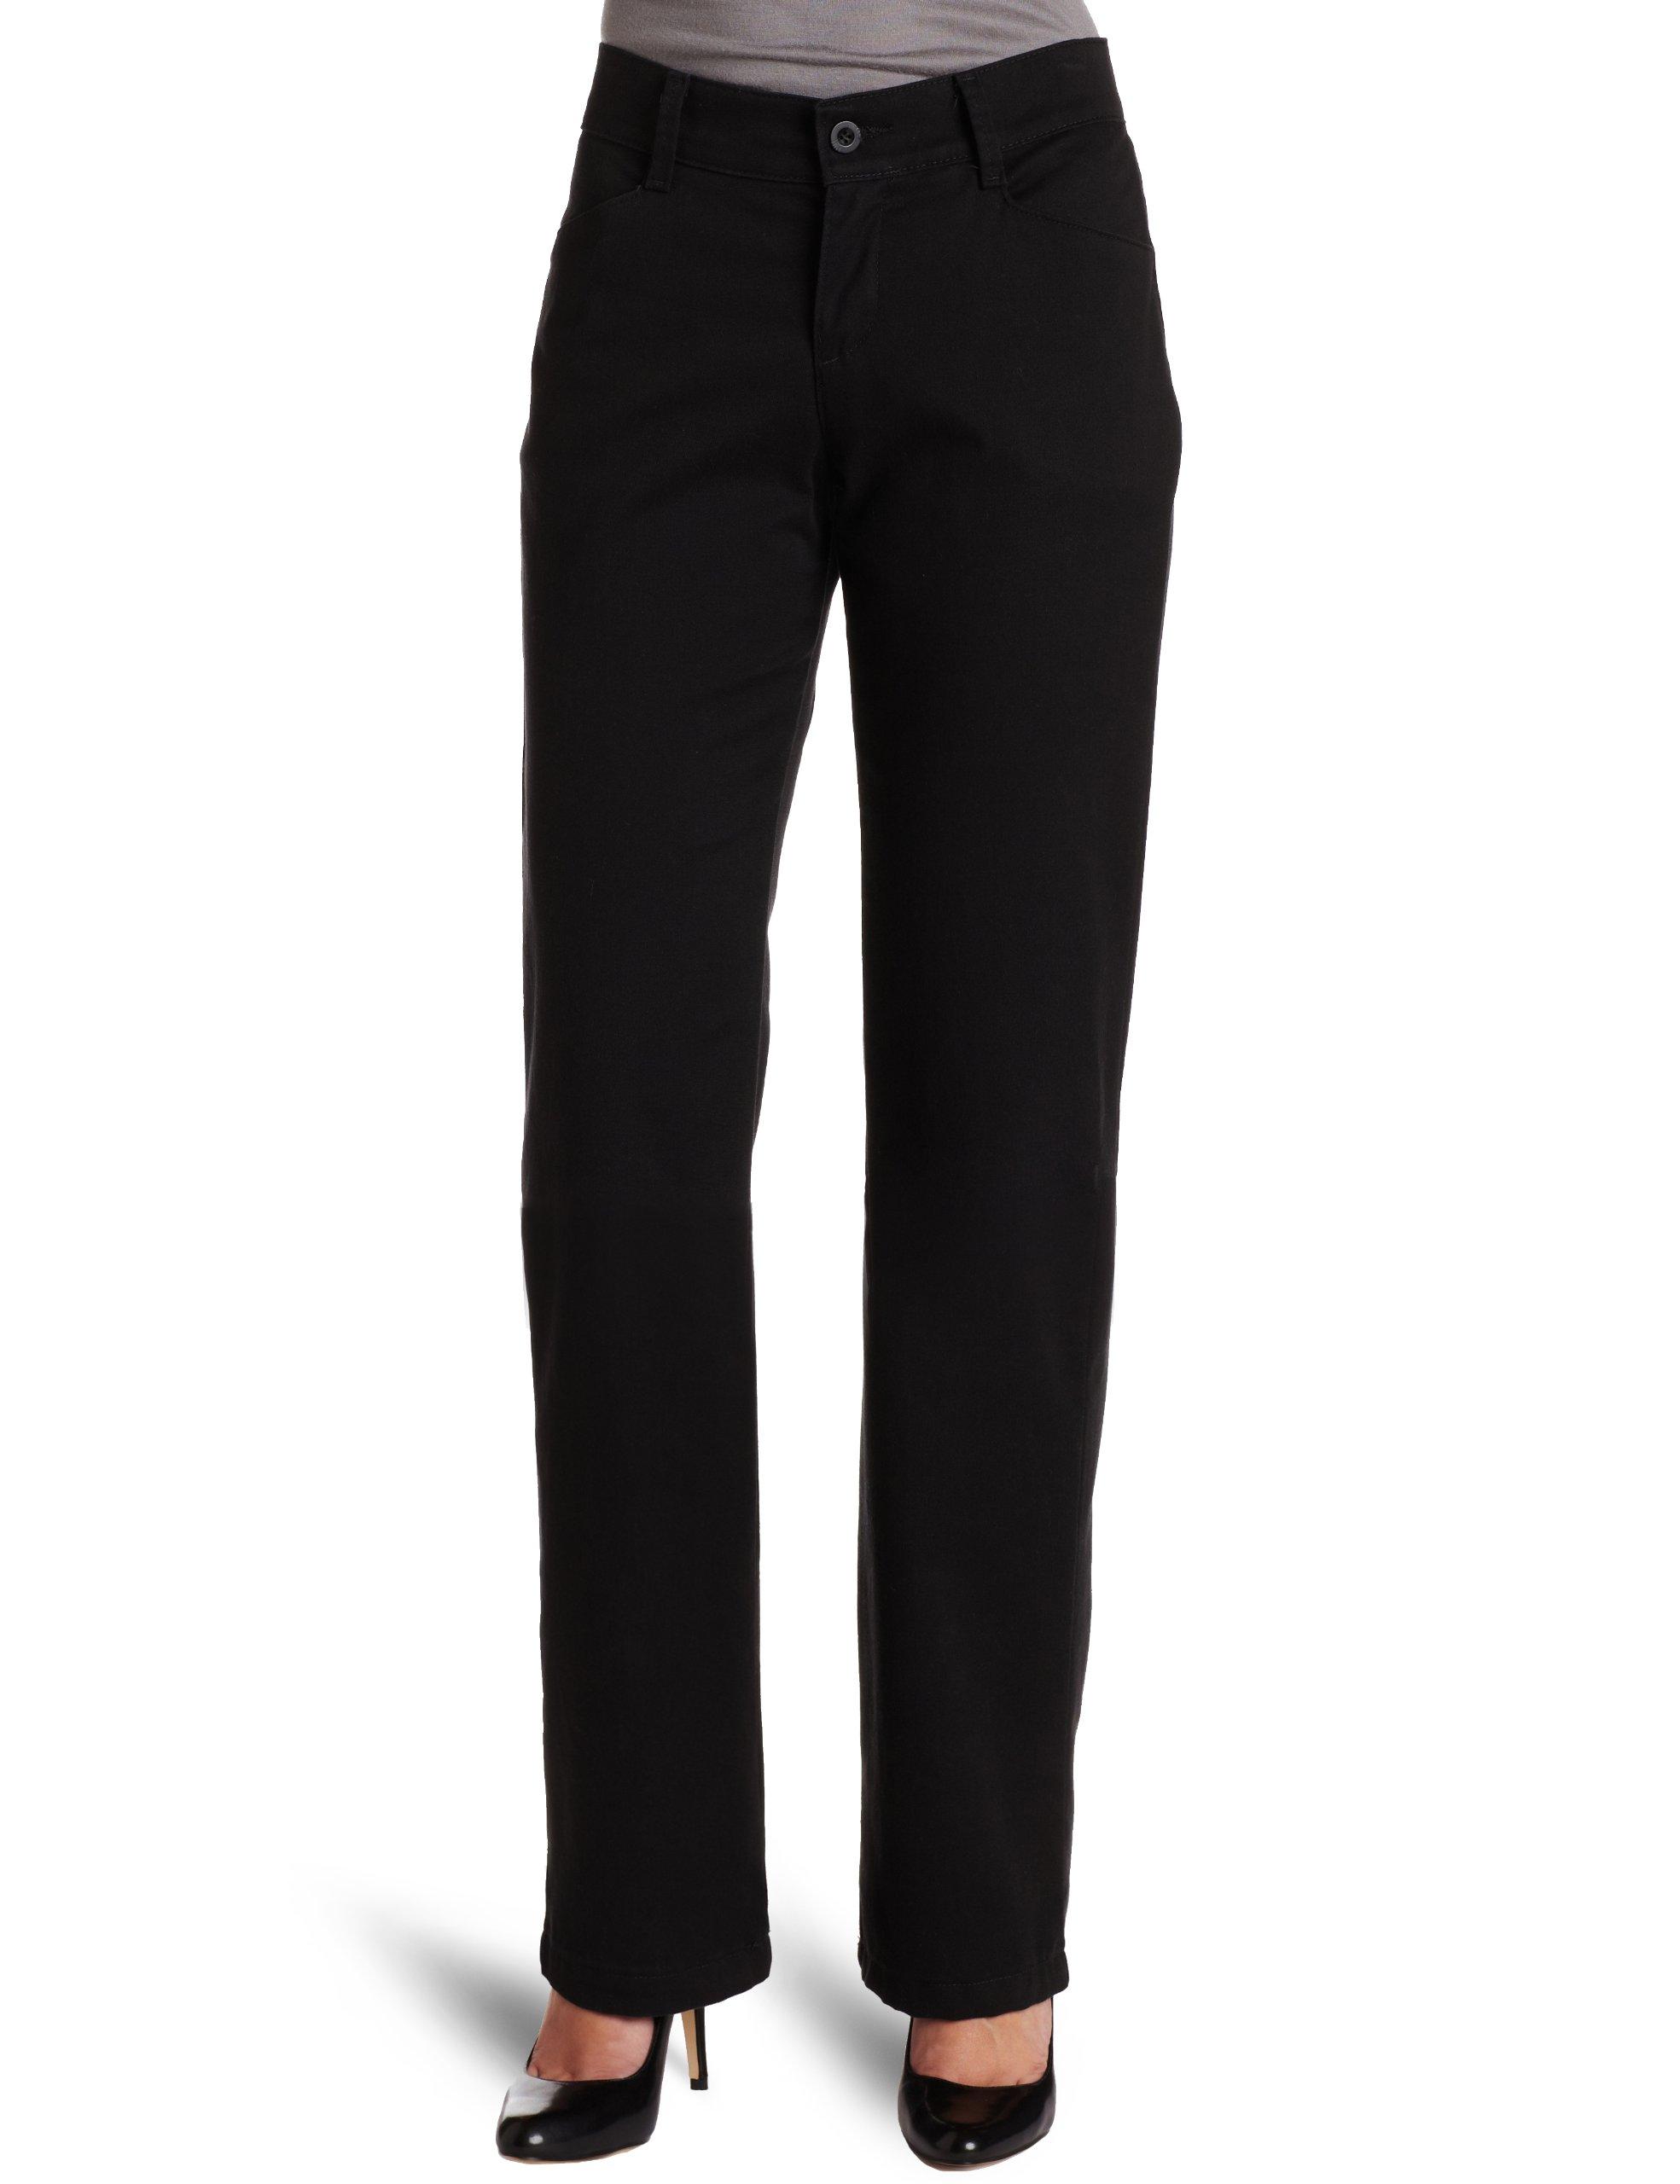 Lee Women's Petite Relaxed Fit Plain Front Straight Leg Pant